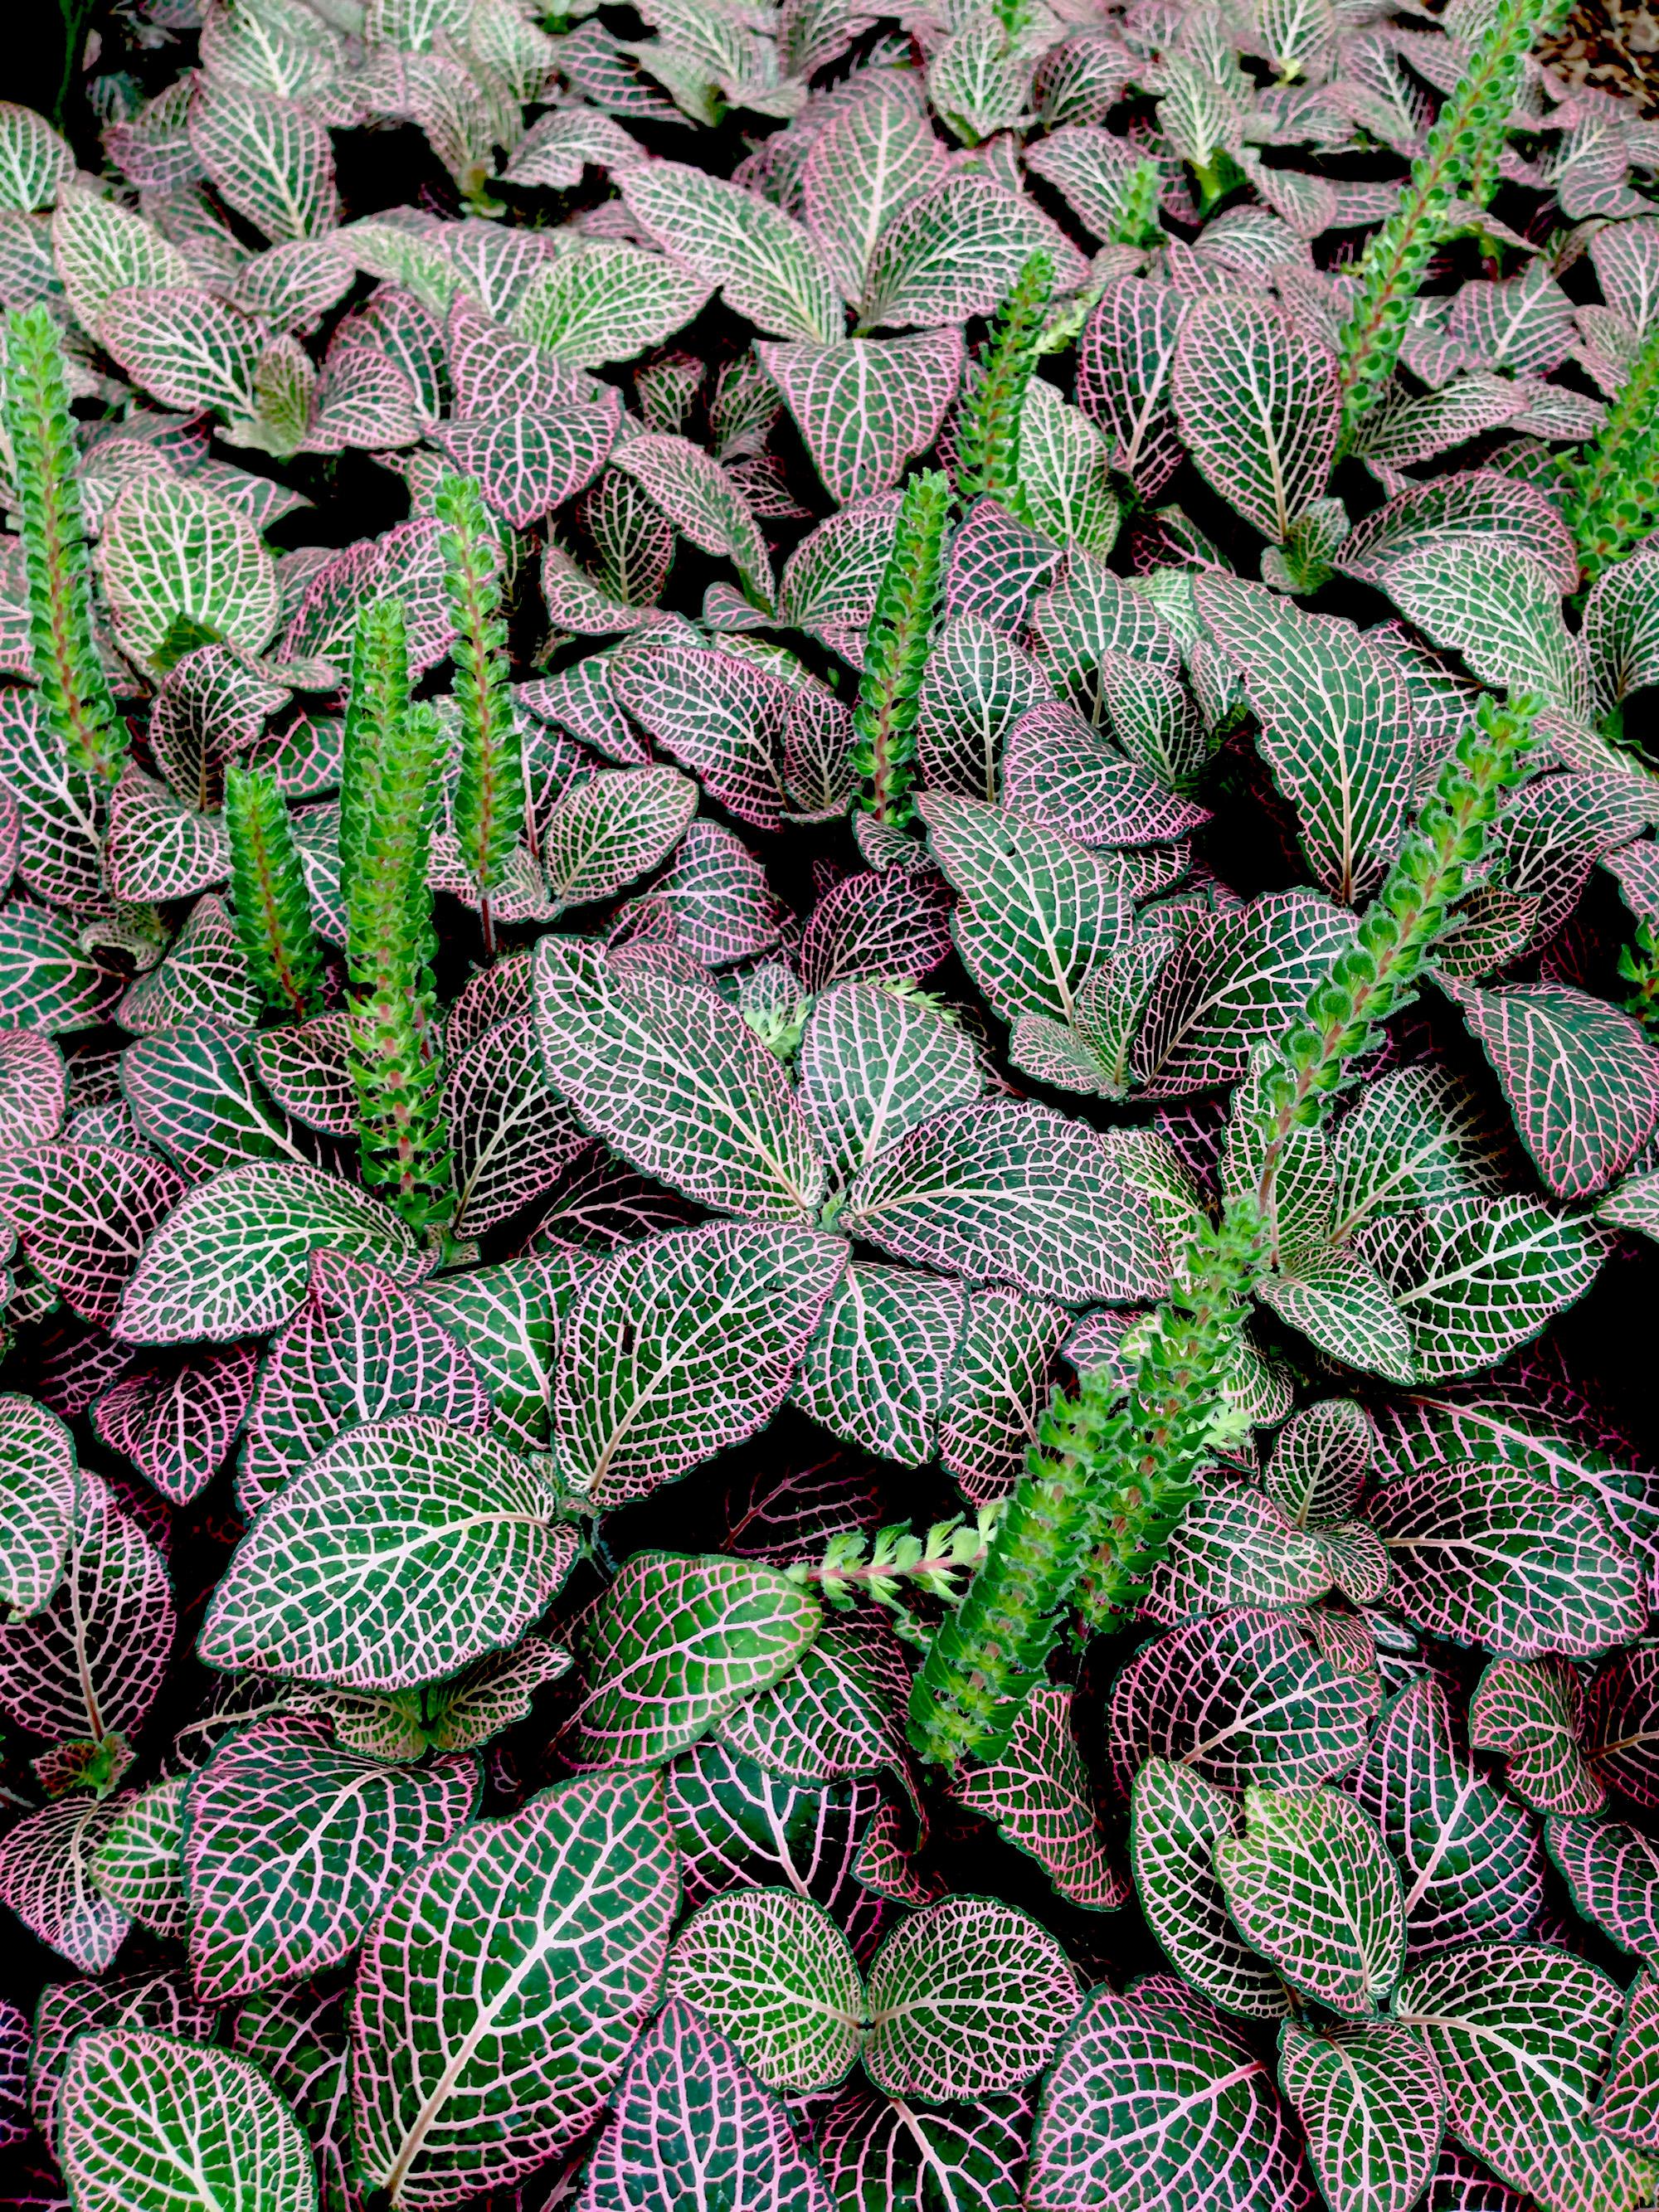 Mosaic Plant (Fittonia verschaffeltii pearcei), Garfield Park Conservatory, Chicago Illinois